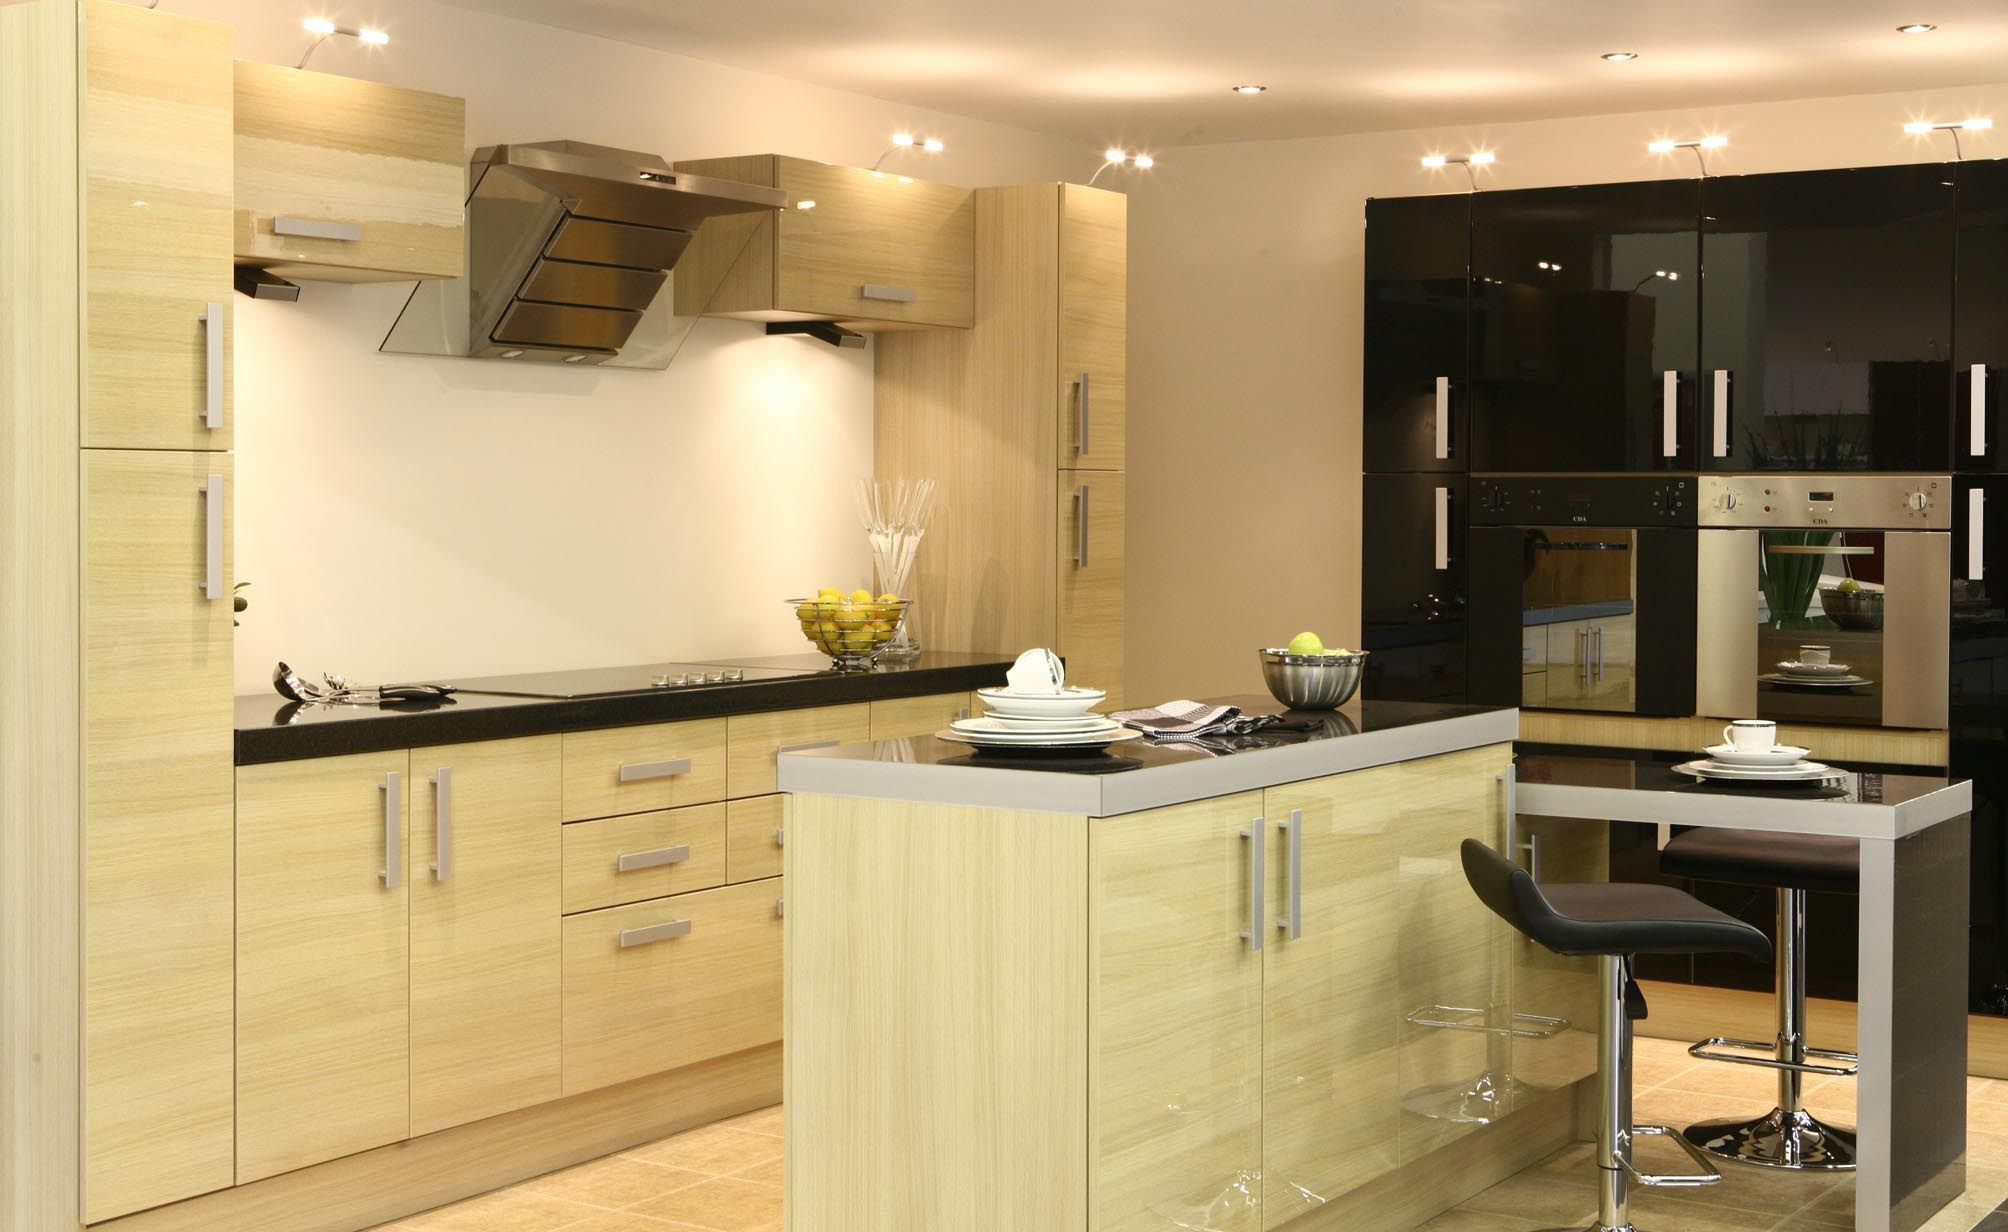 house designs pakistan india small kitchen design ideas gallery